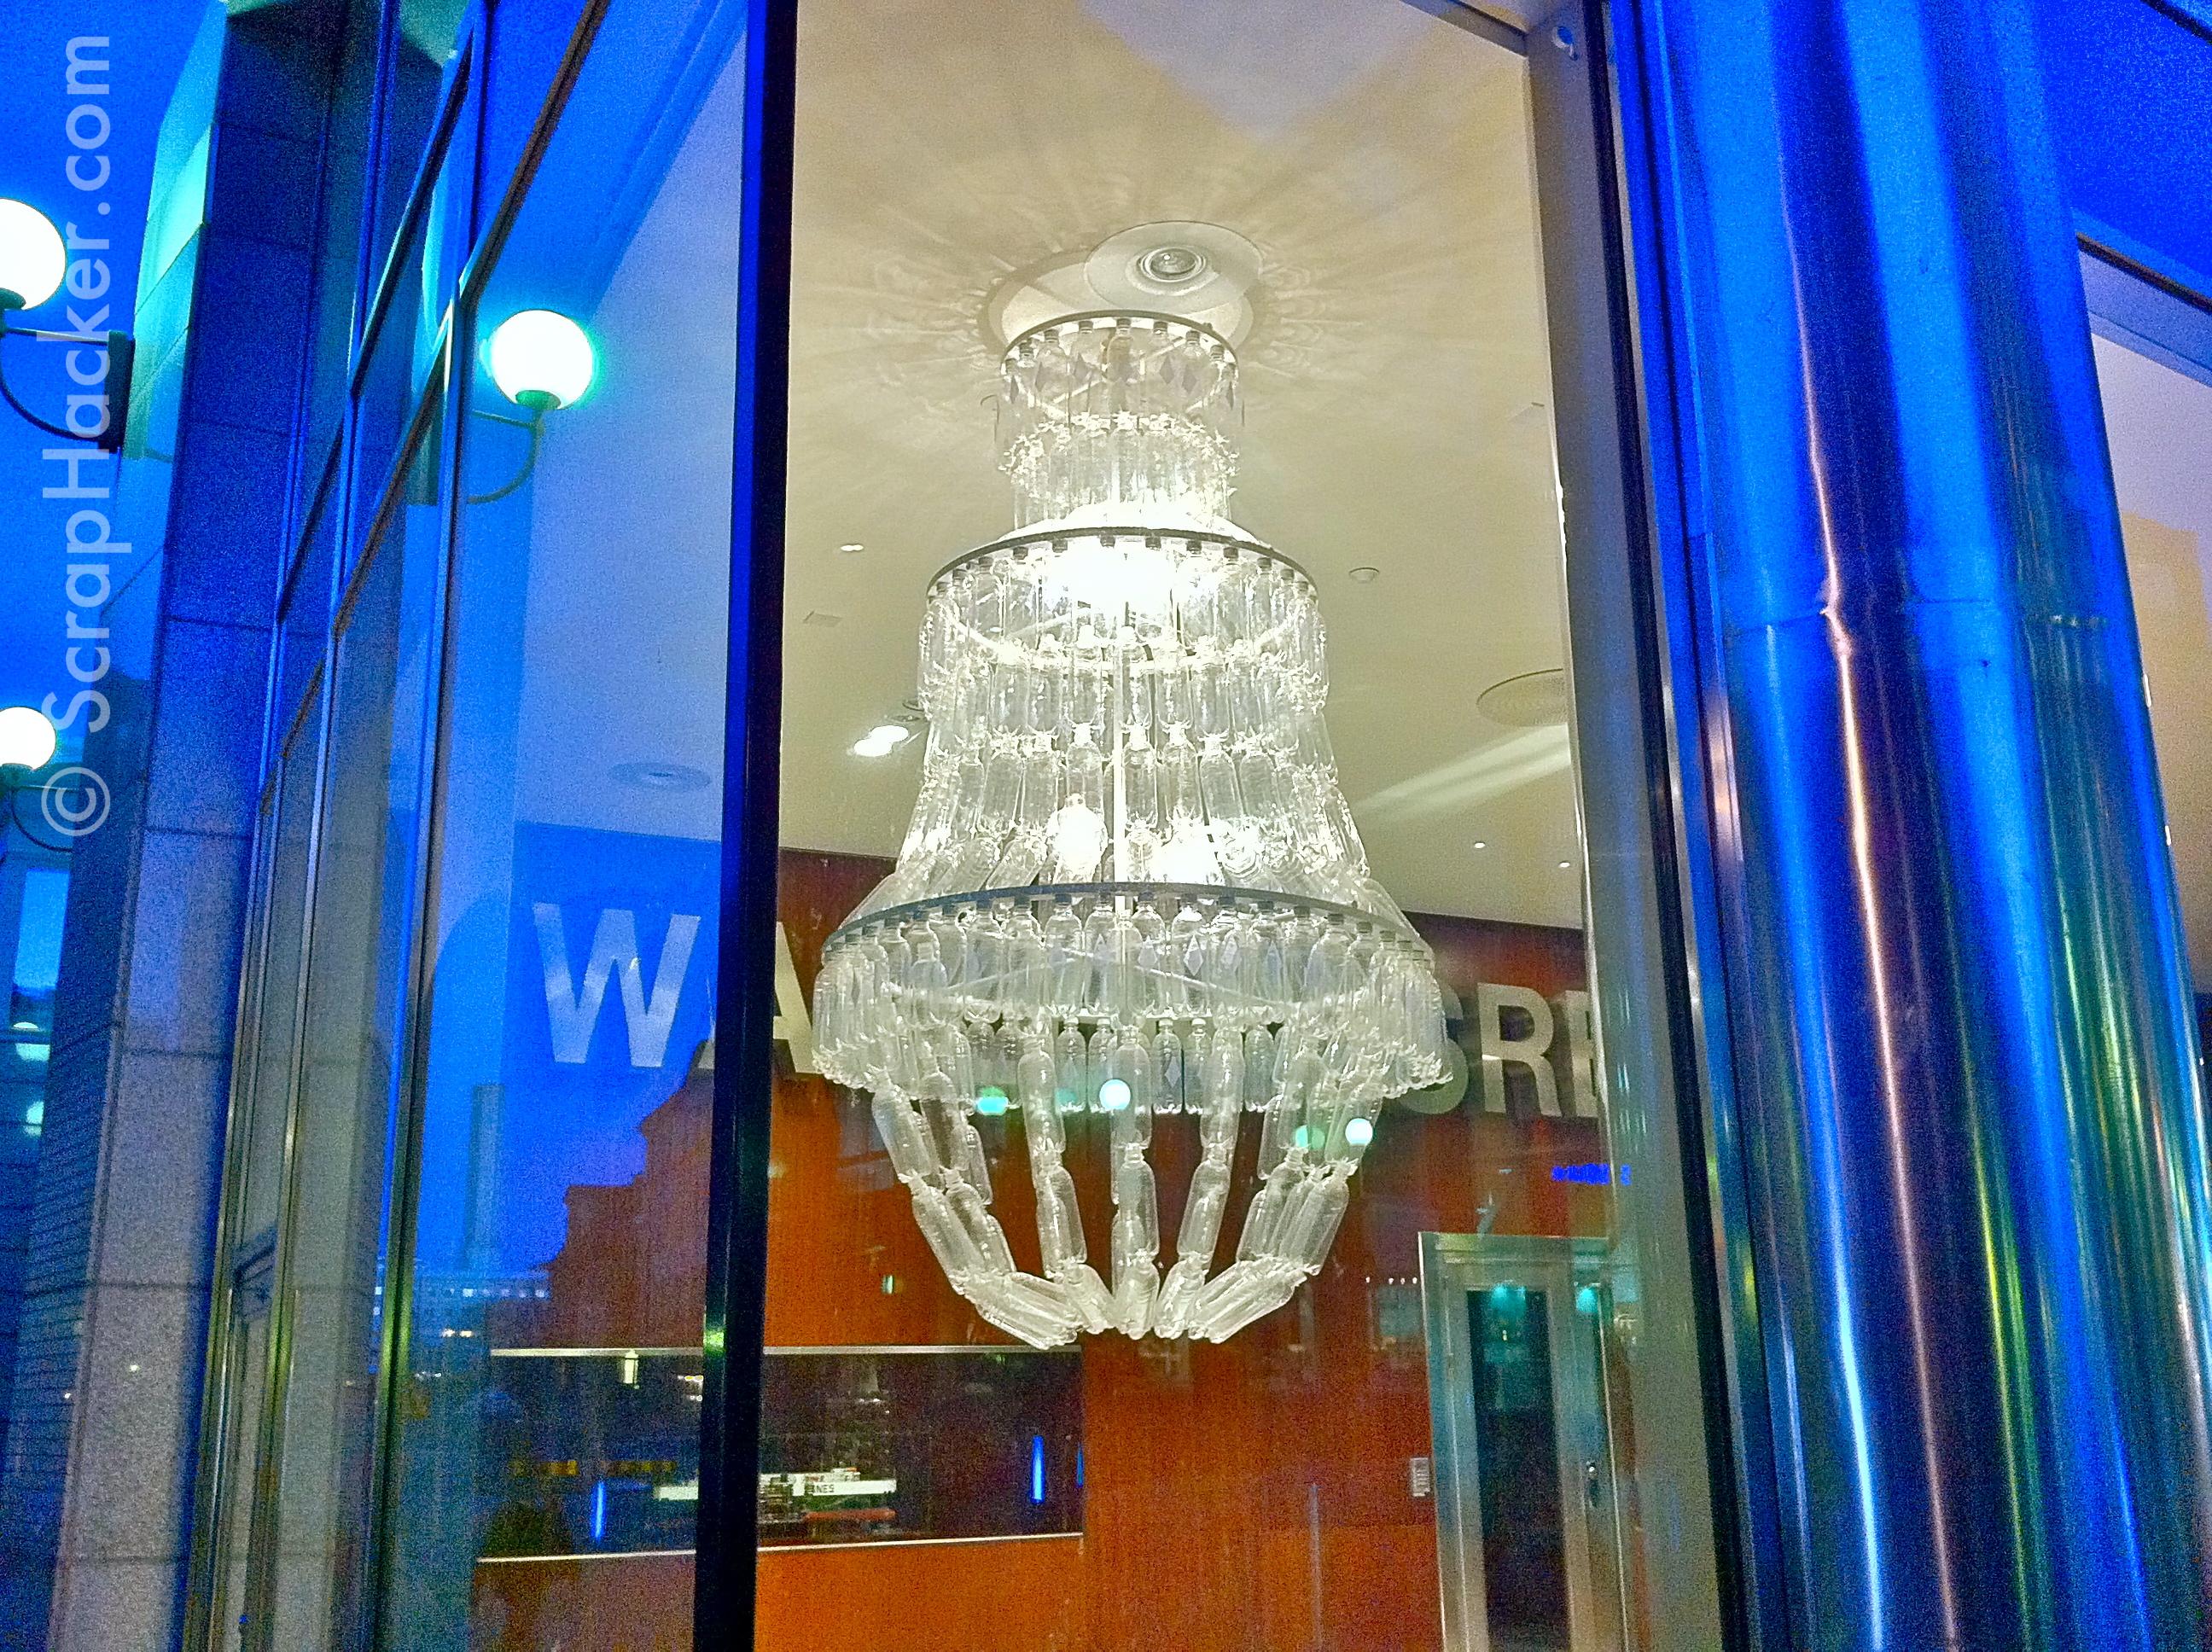 How to make a plastic bottle chandelier chandelier designs genius in a bottle the amazing plastic chandelier arubaitofo Images